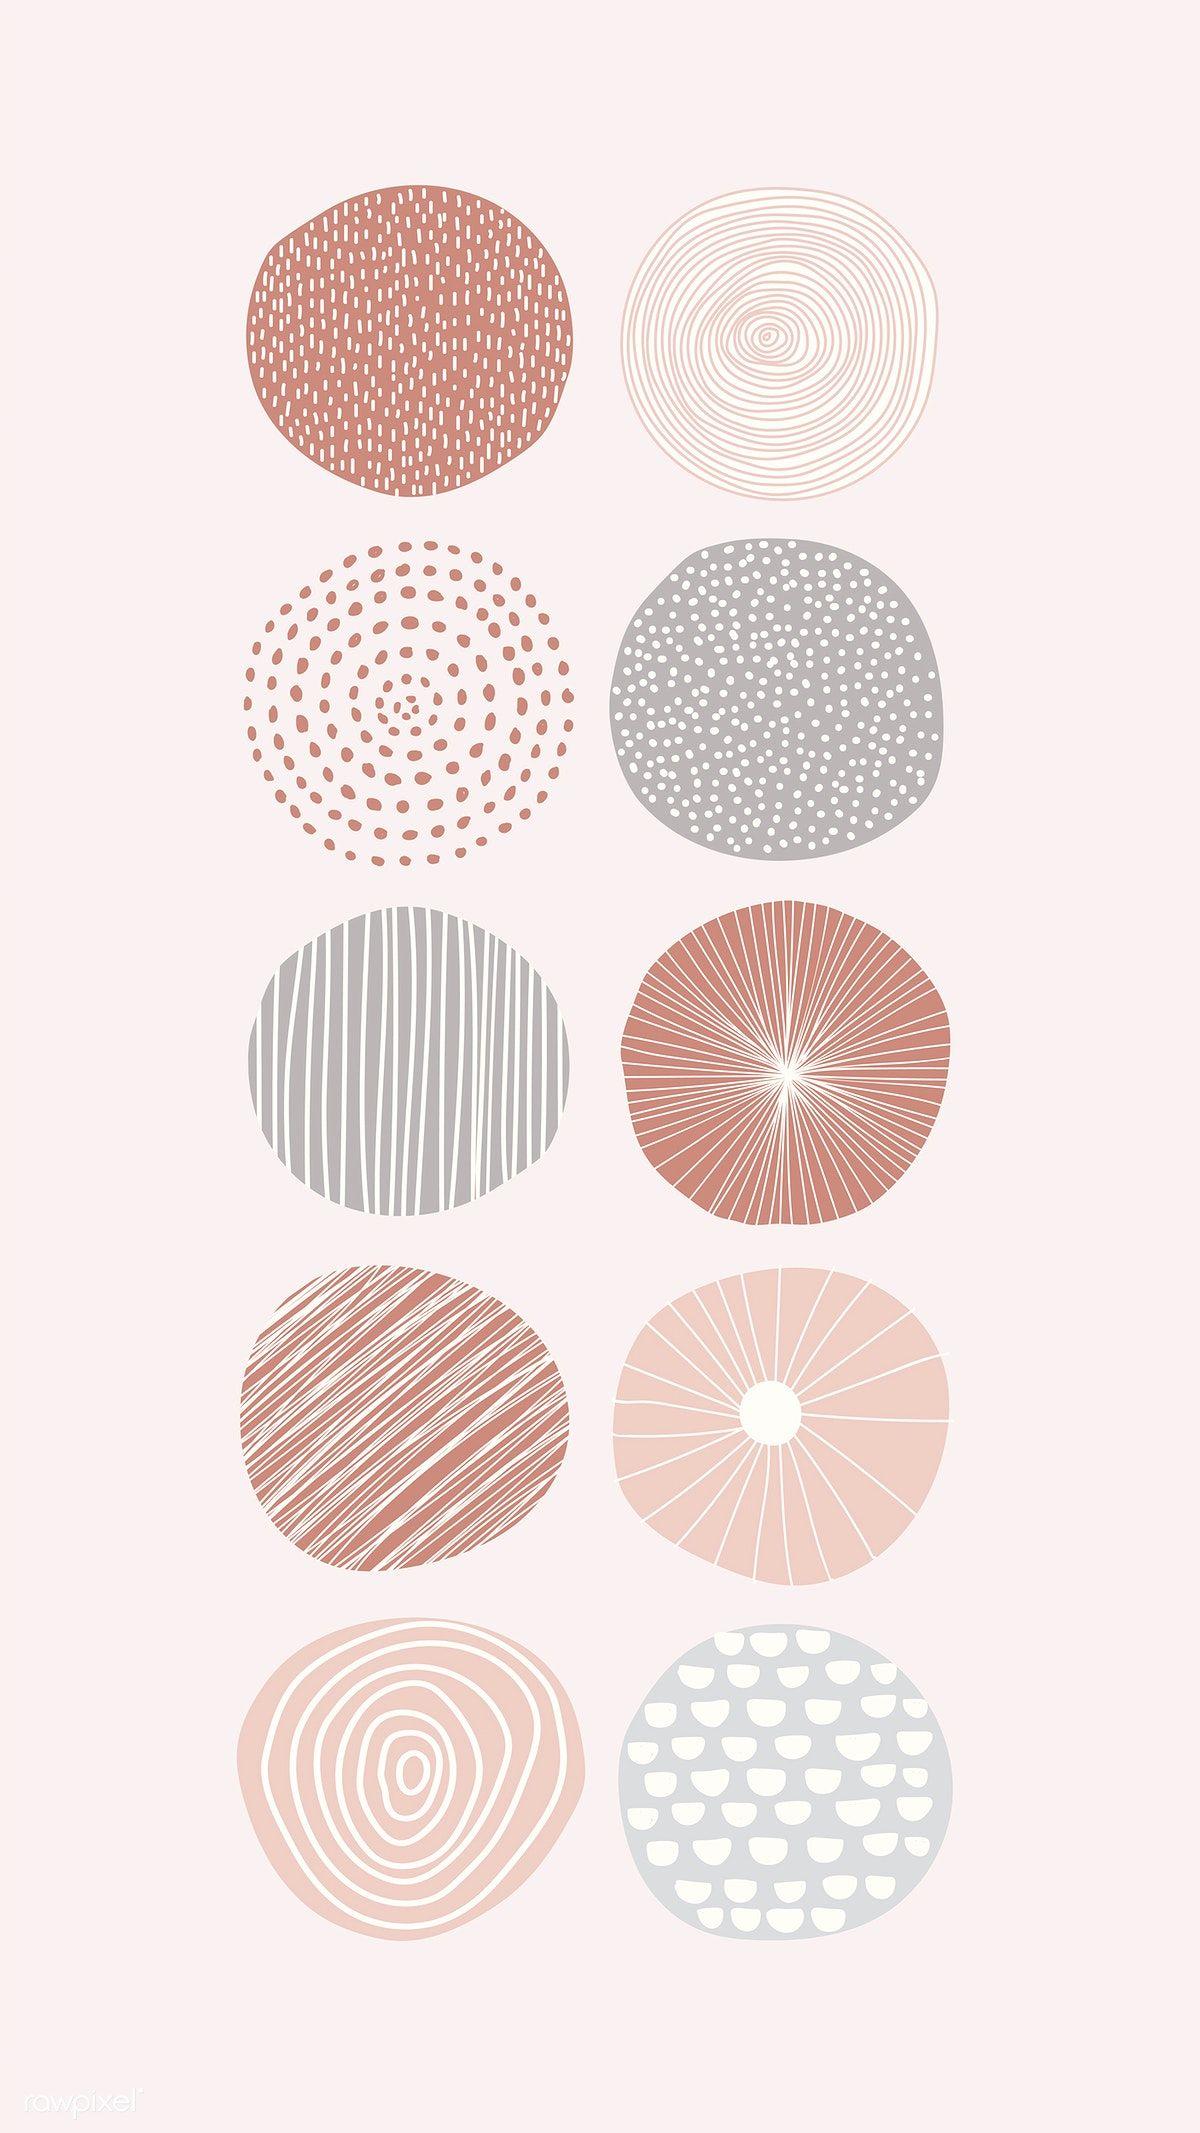 Download Premium Illustration Of Round Patterned Doodle Background